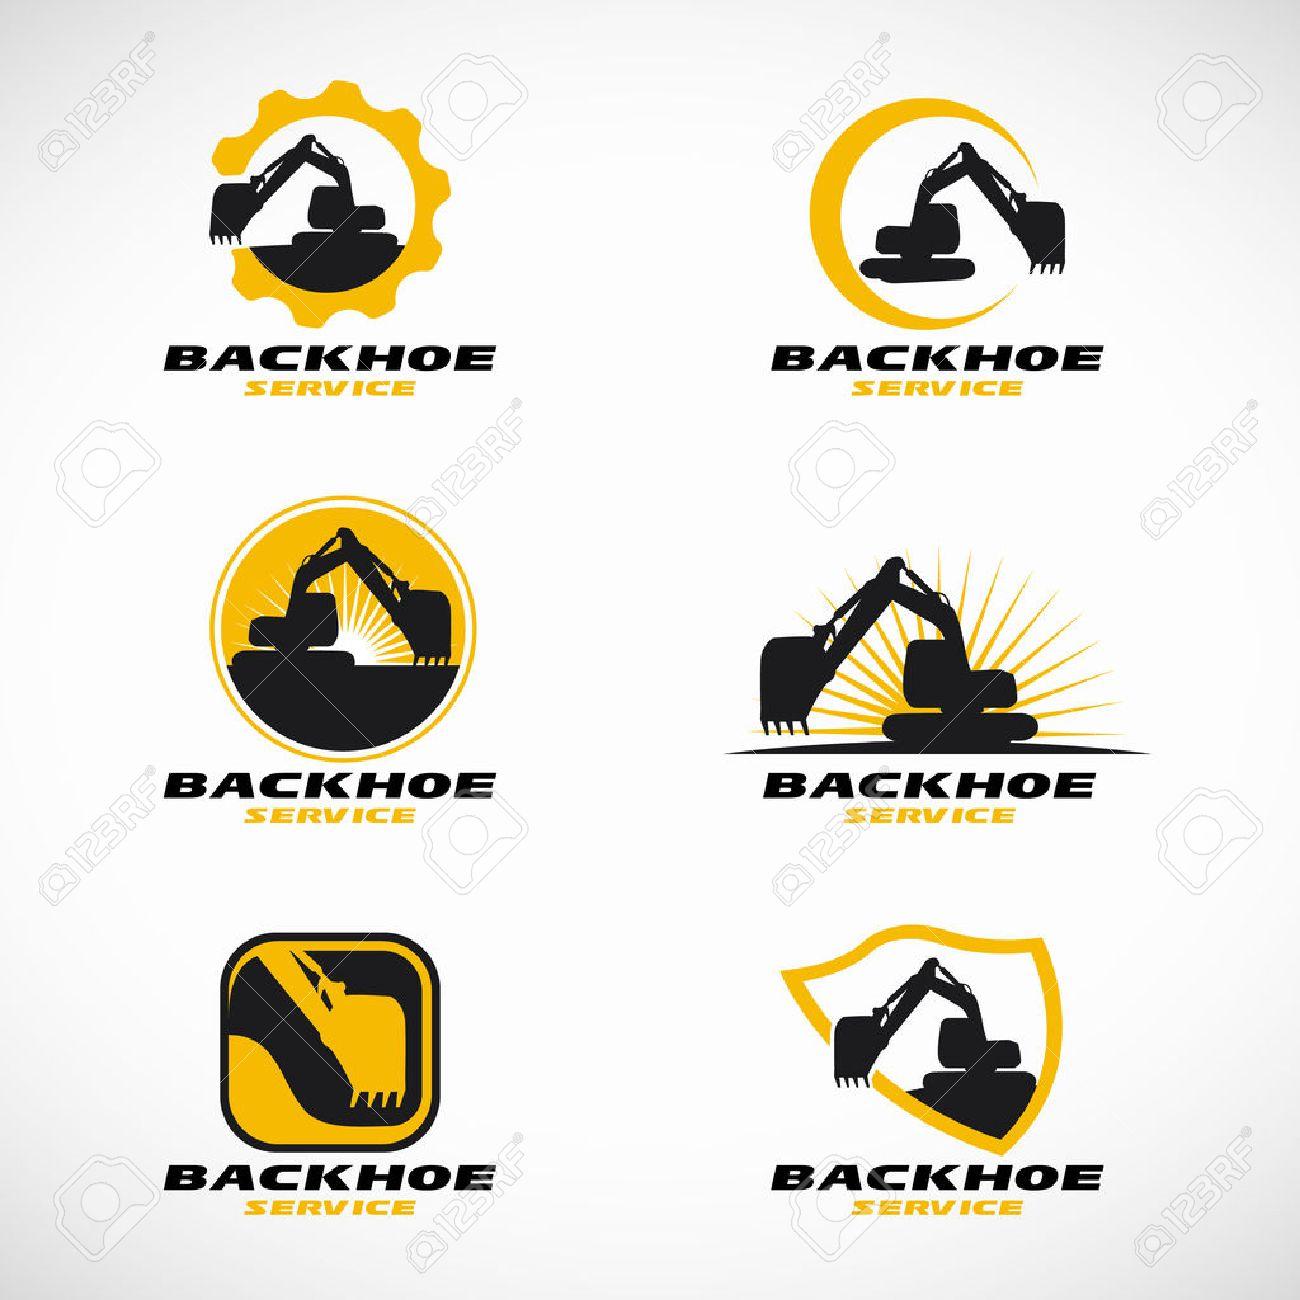 Yellow and black Backhoe logo vector set design.